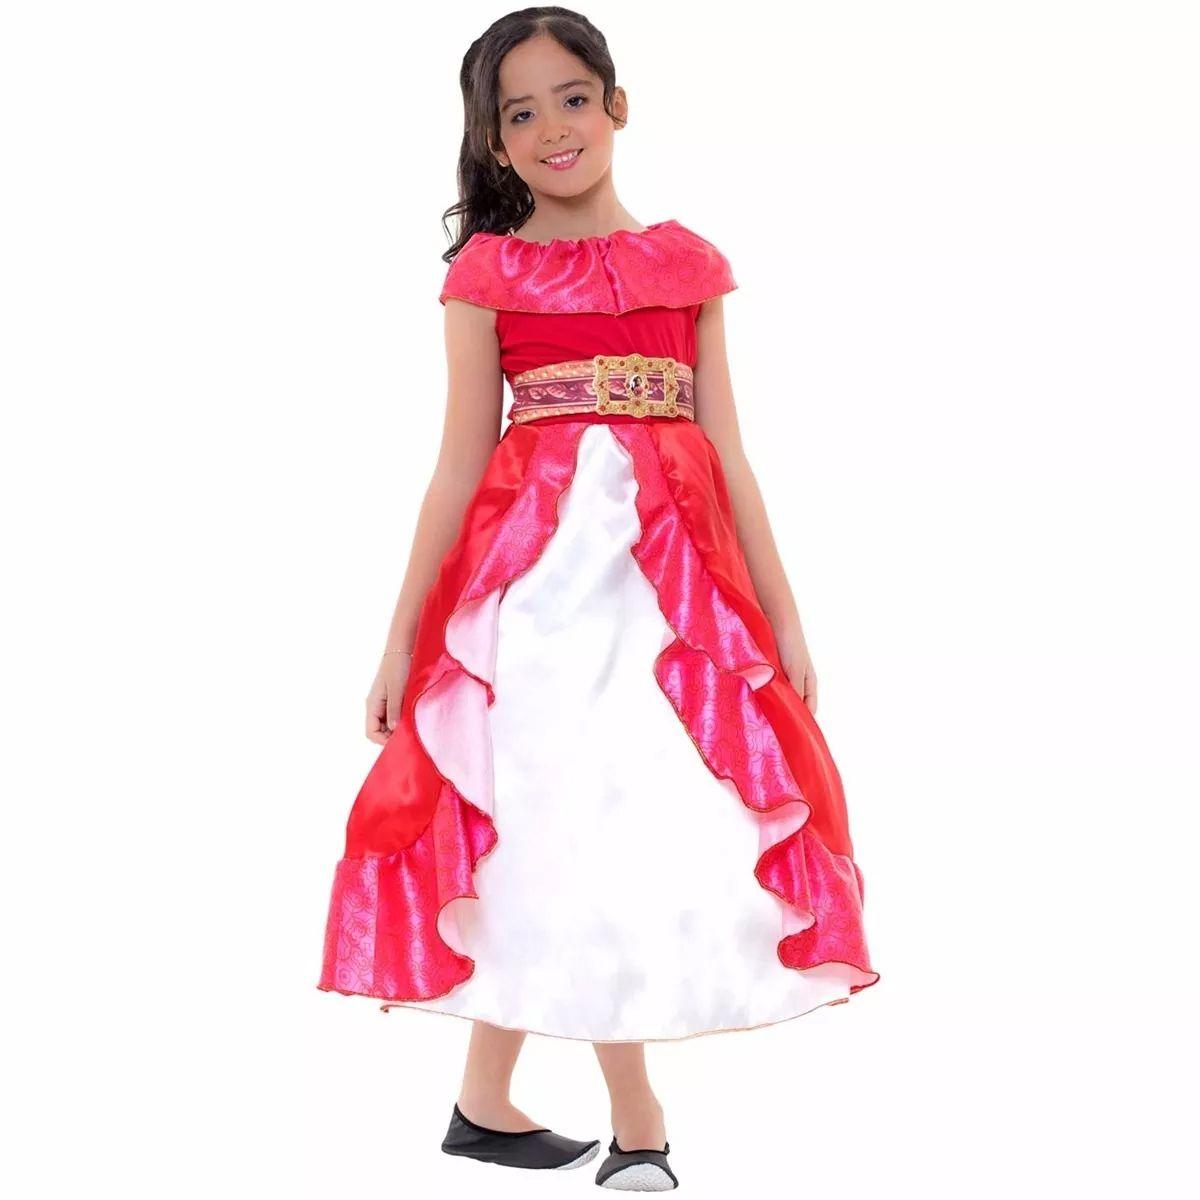 Fantasia Princesa Elena de Avalor